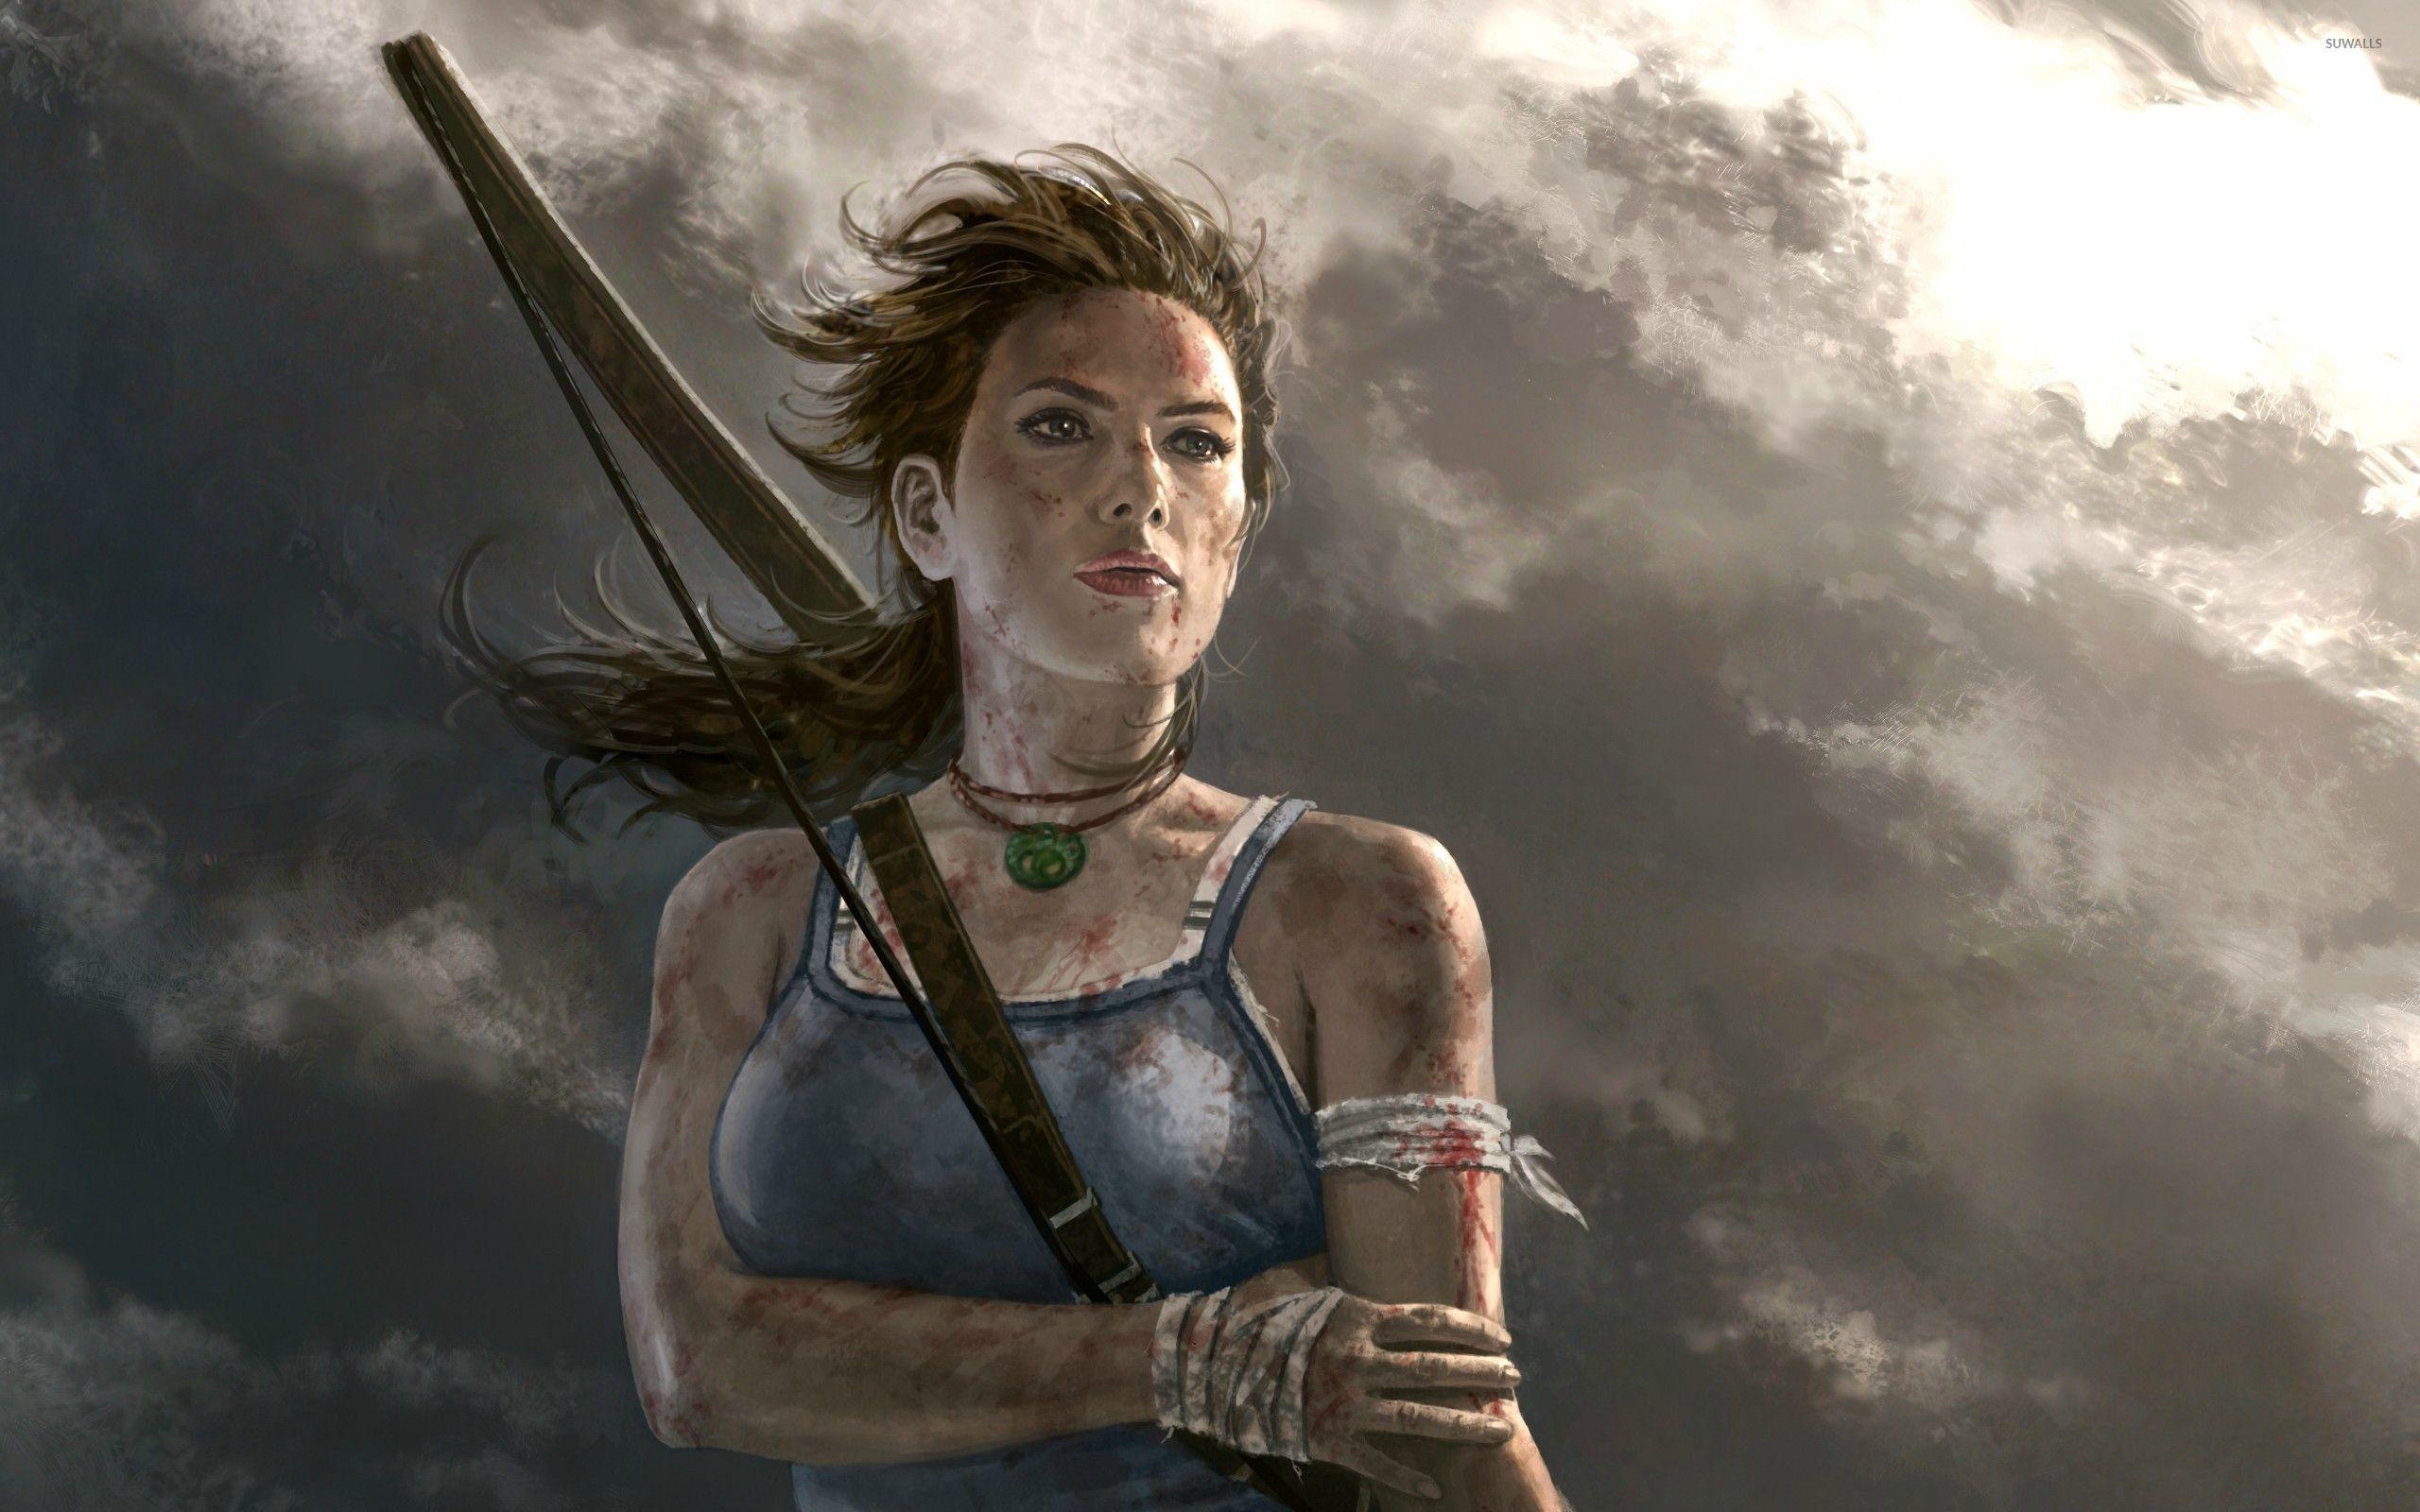 Lara Croft Tomb Raider 10 Wallpaper Game Wallpapers 27086